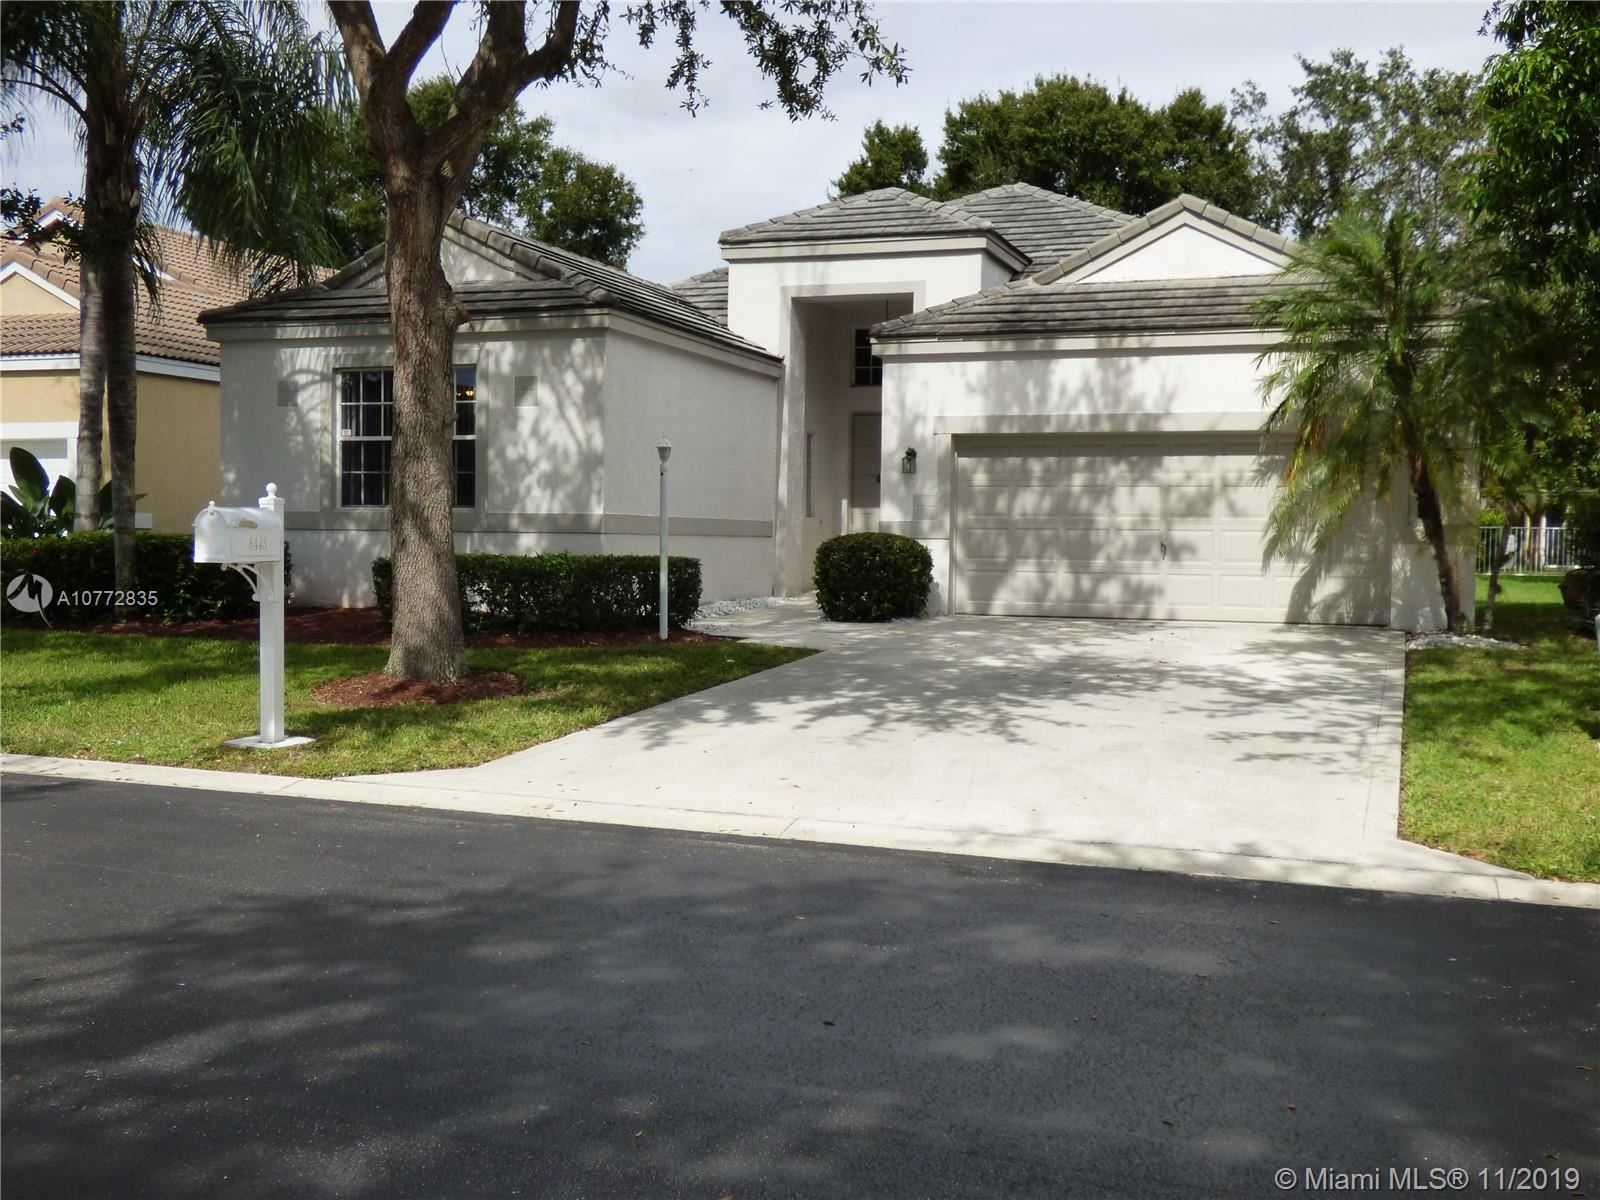 6443 NW 78th Dr, Parkland, FL 33067 - MLS#: A10772835